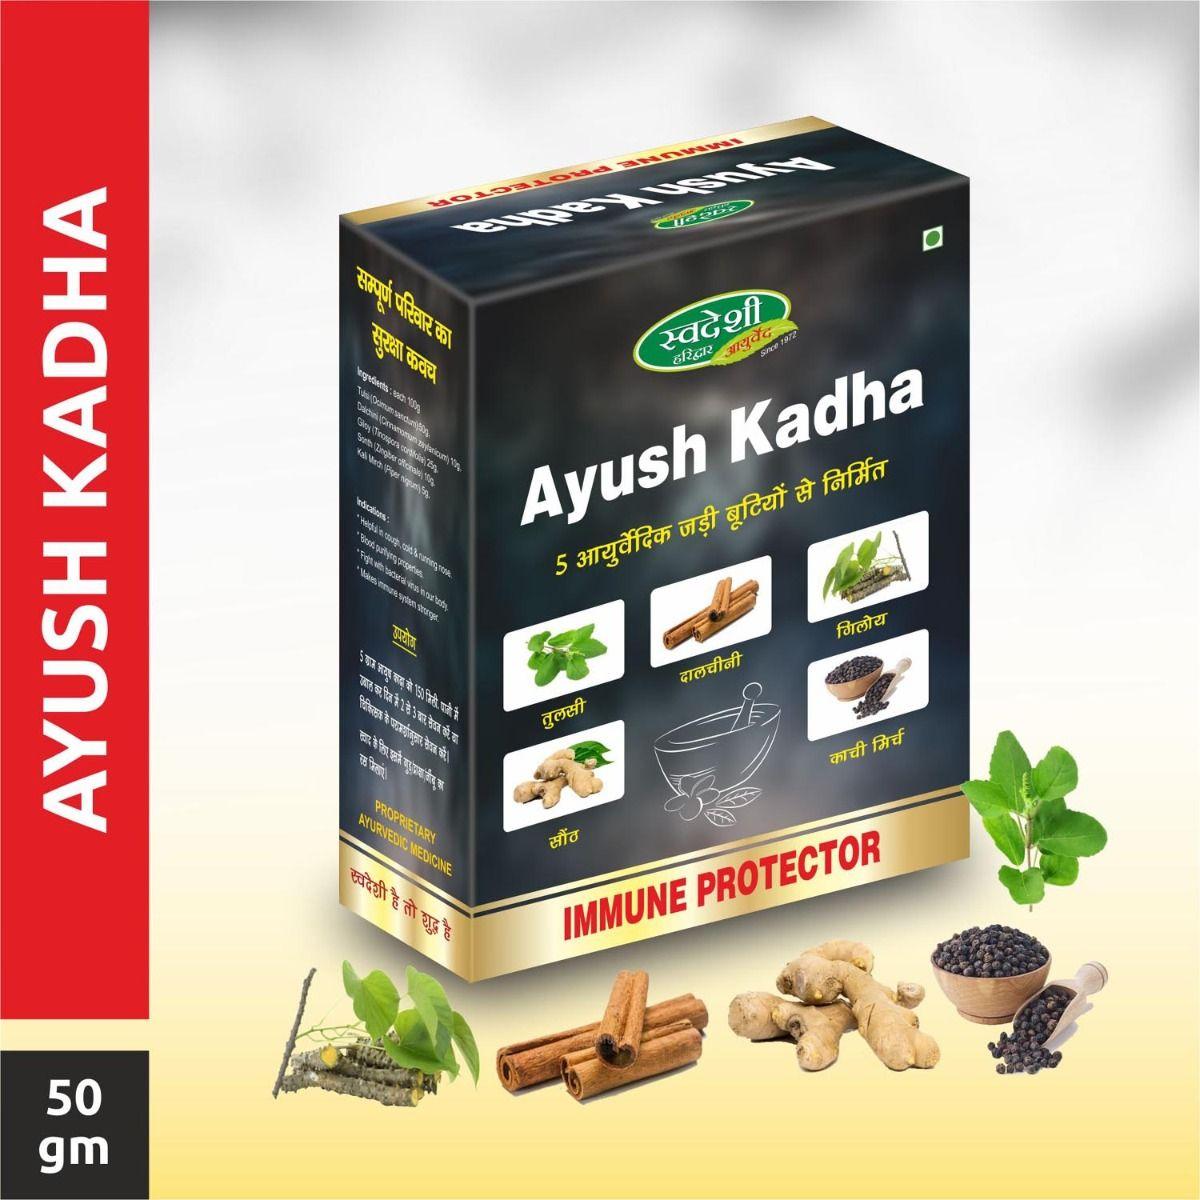 Swadeshi Kwath Ayush Kadha, 50 gm